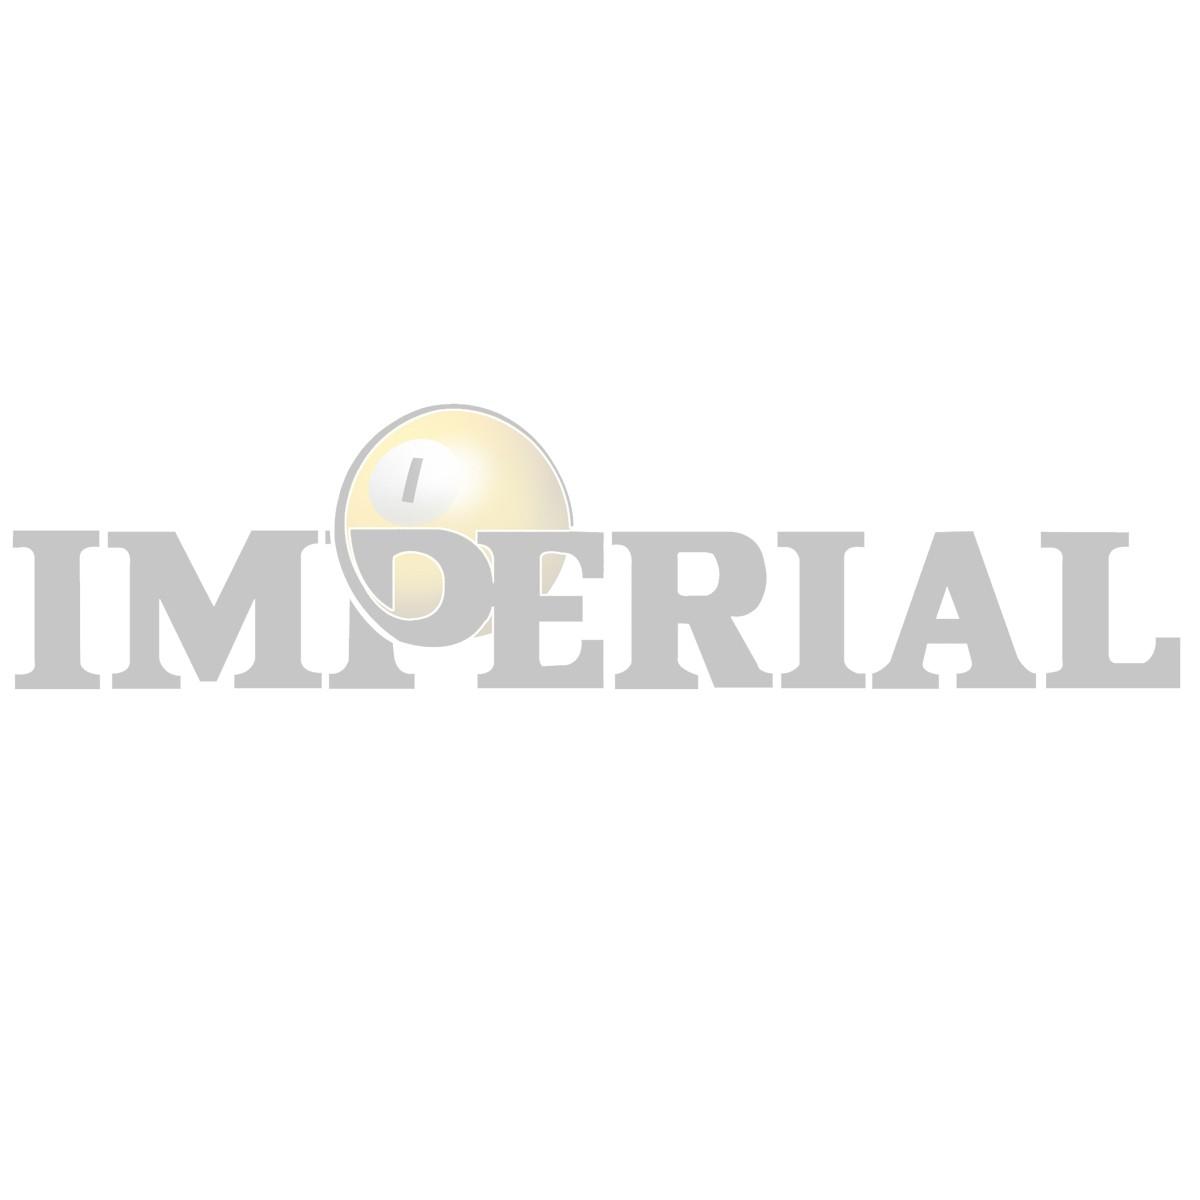 Indianapolis Colts 9-foot Billiard Cloth